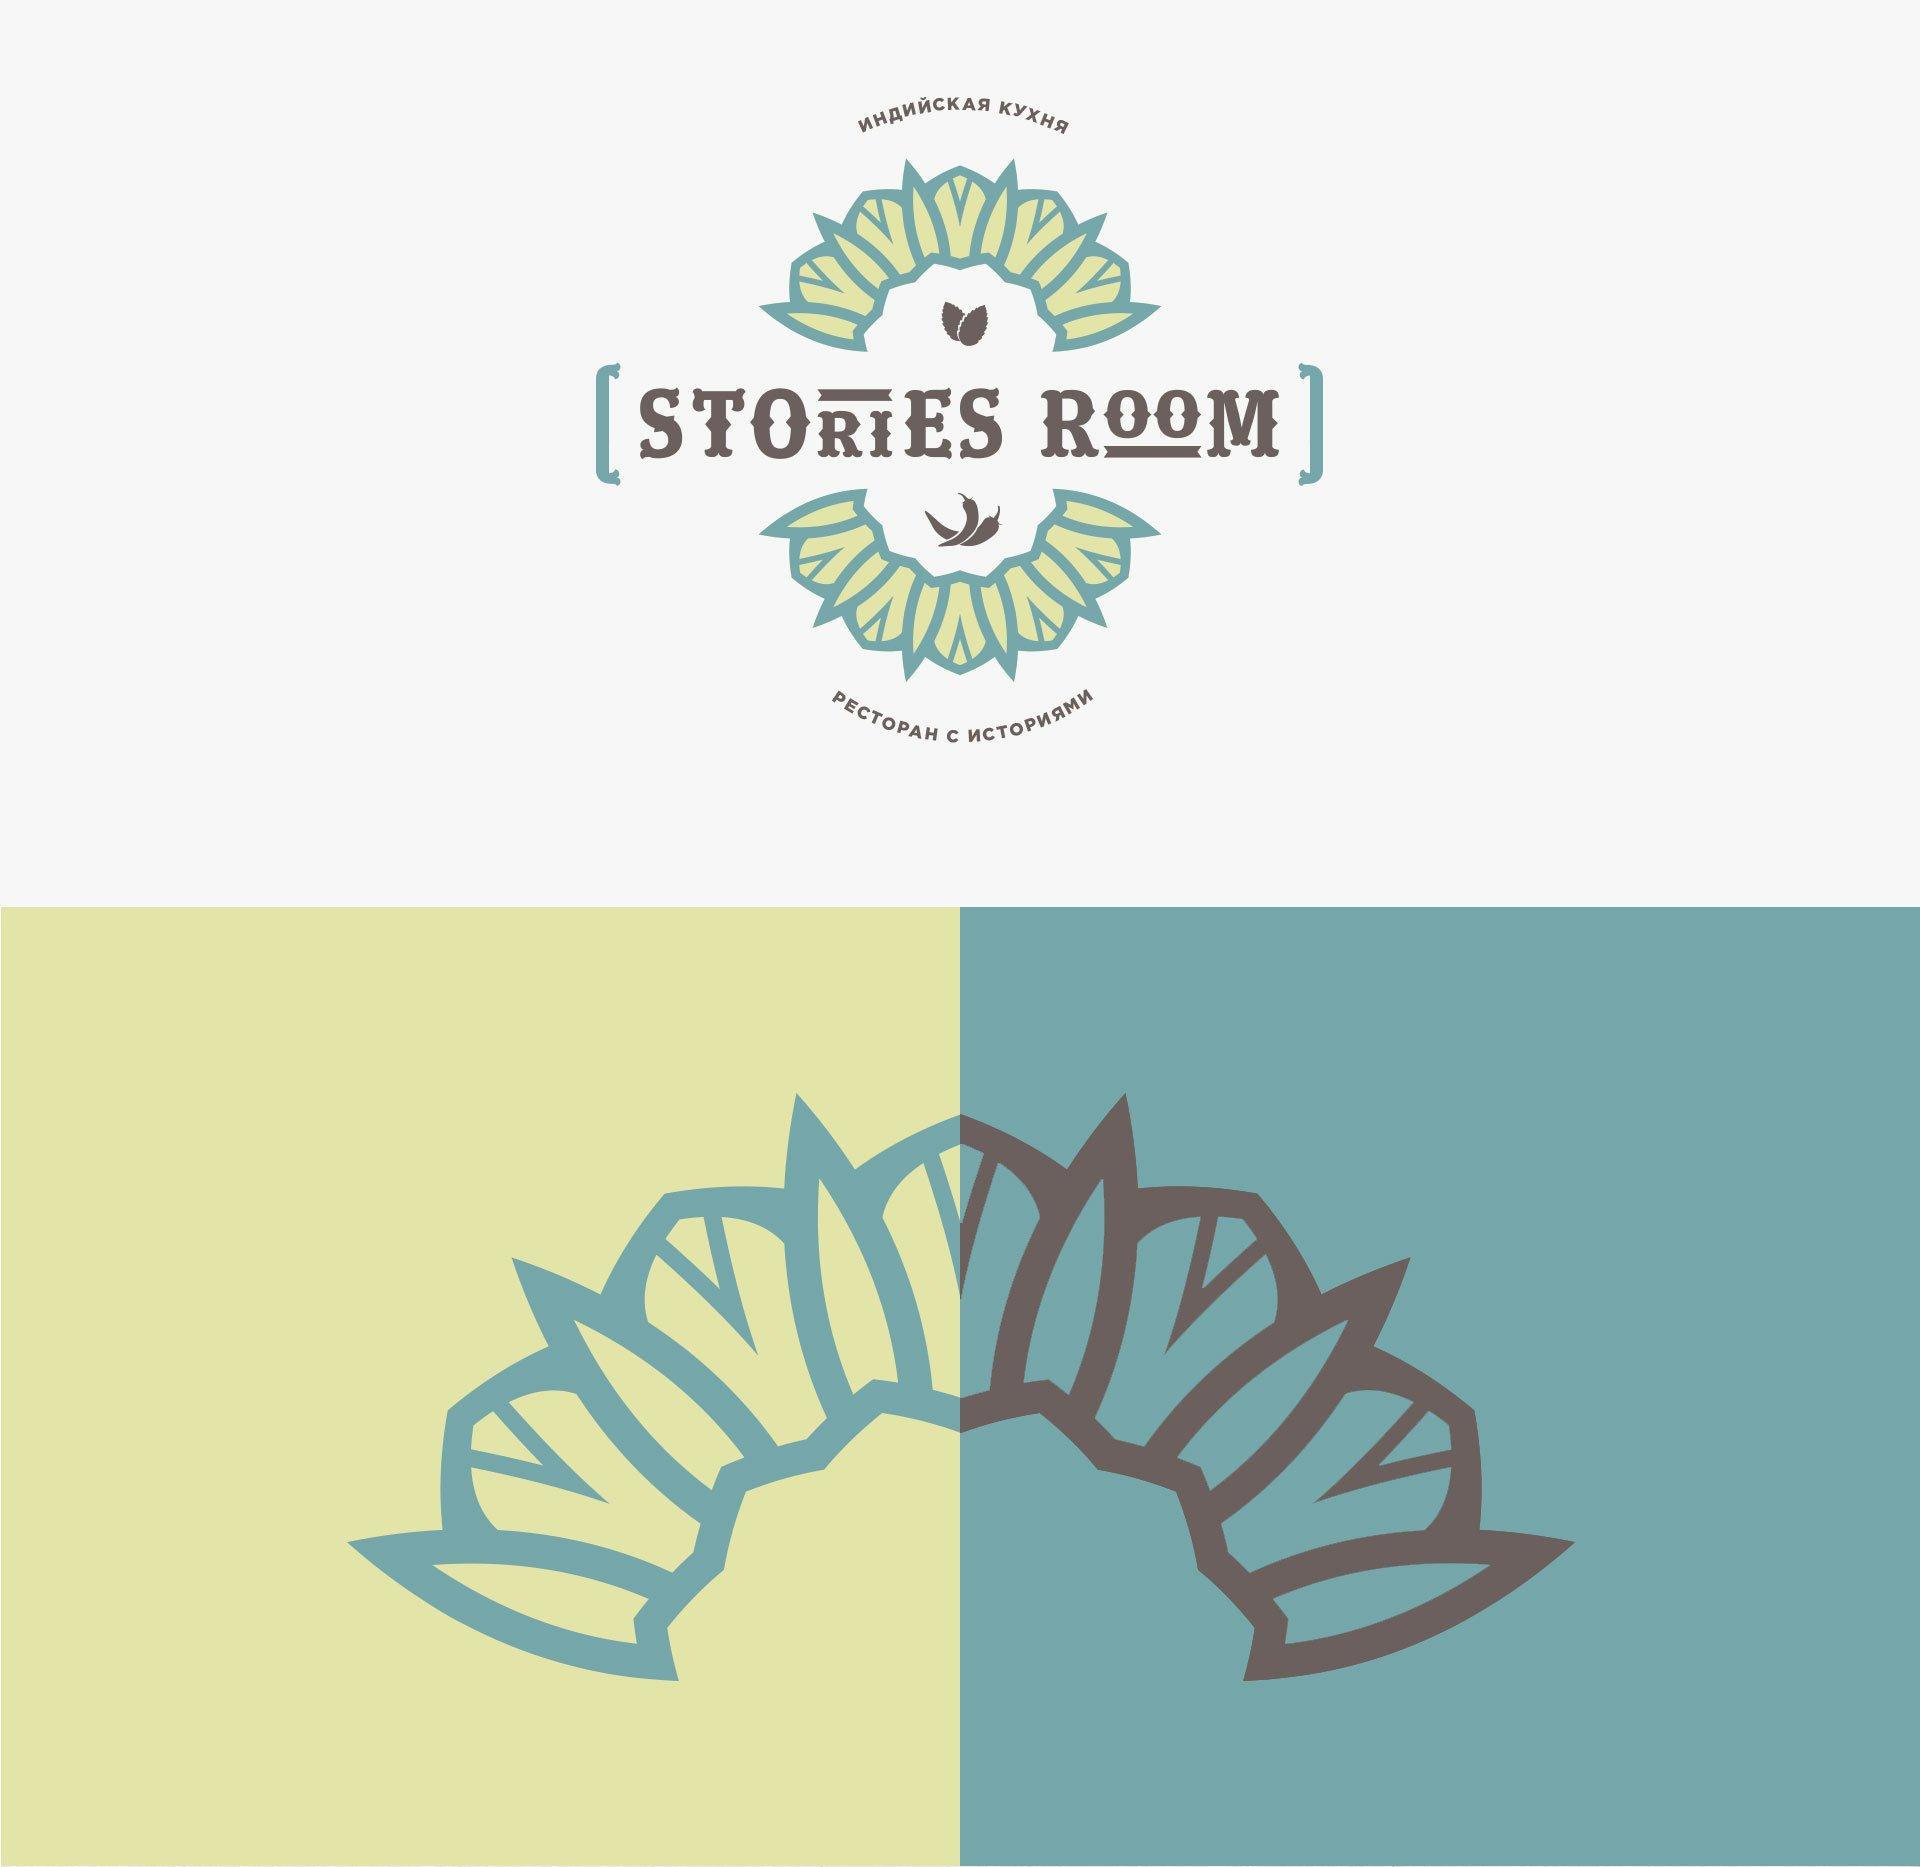 Stories-room-01